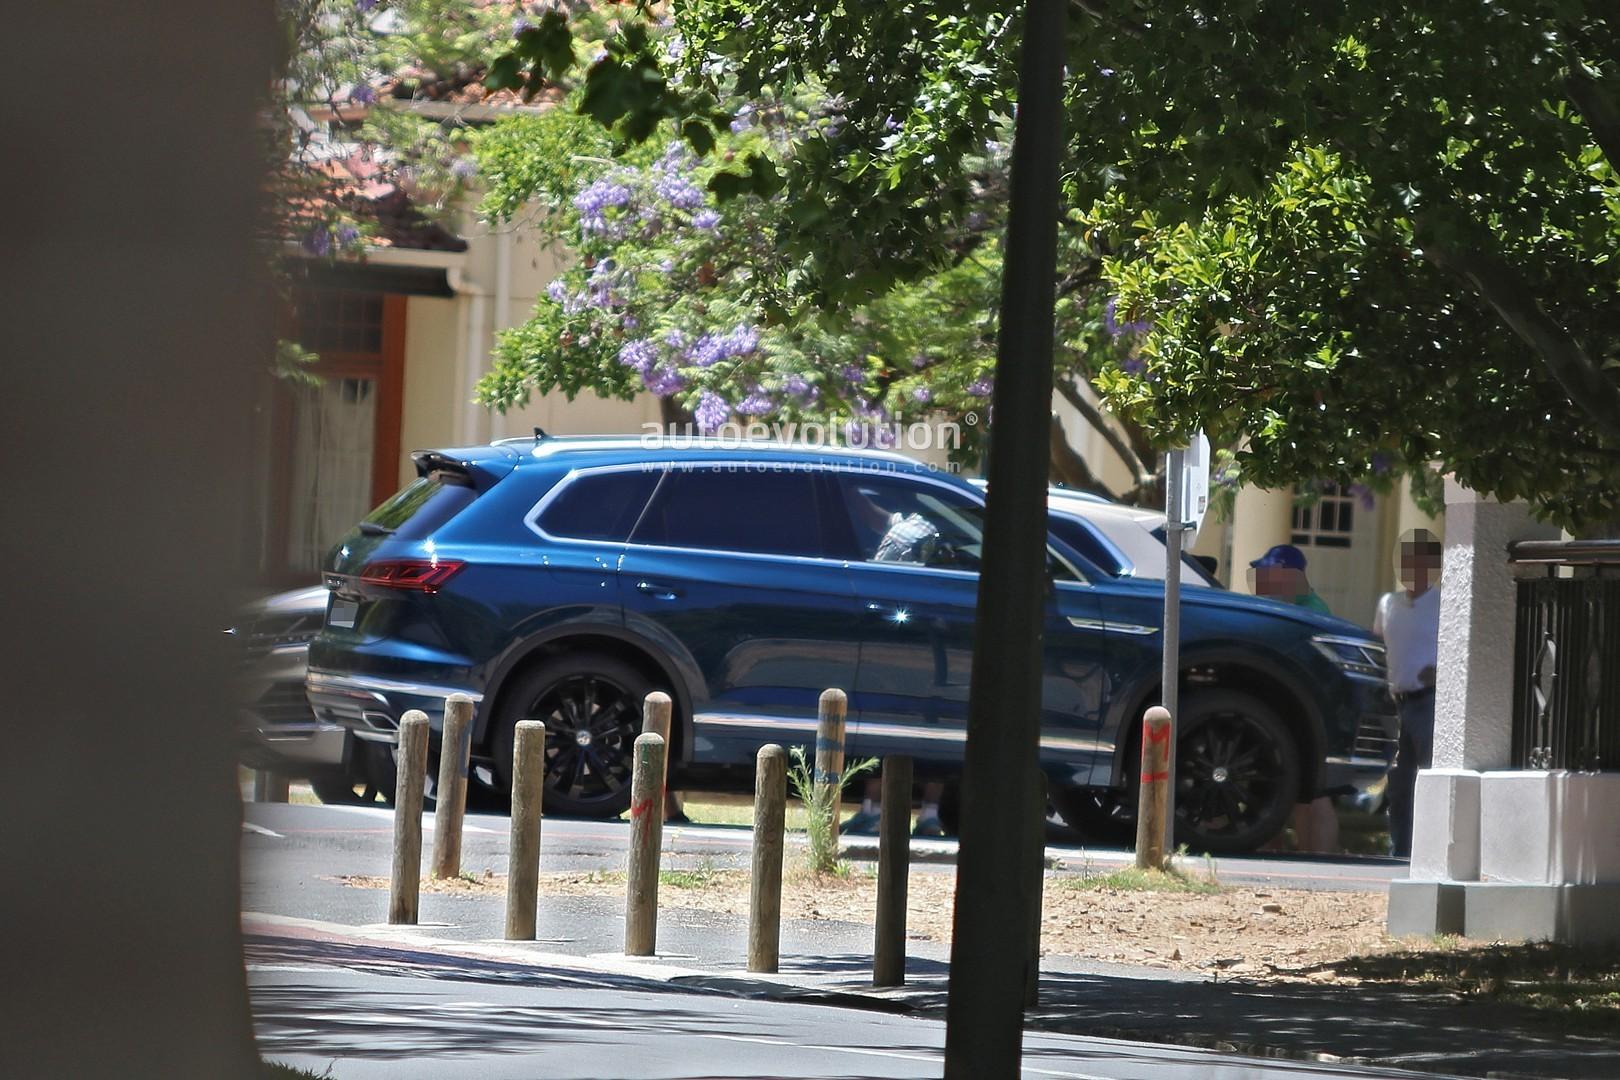 Volkswagen Touareg 2019 >> 2019 Volkswagen Touareg Revealed in Full by Latest Spy Photos - autoevolution